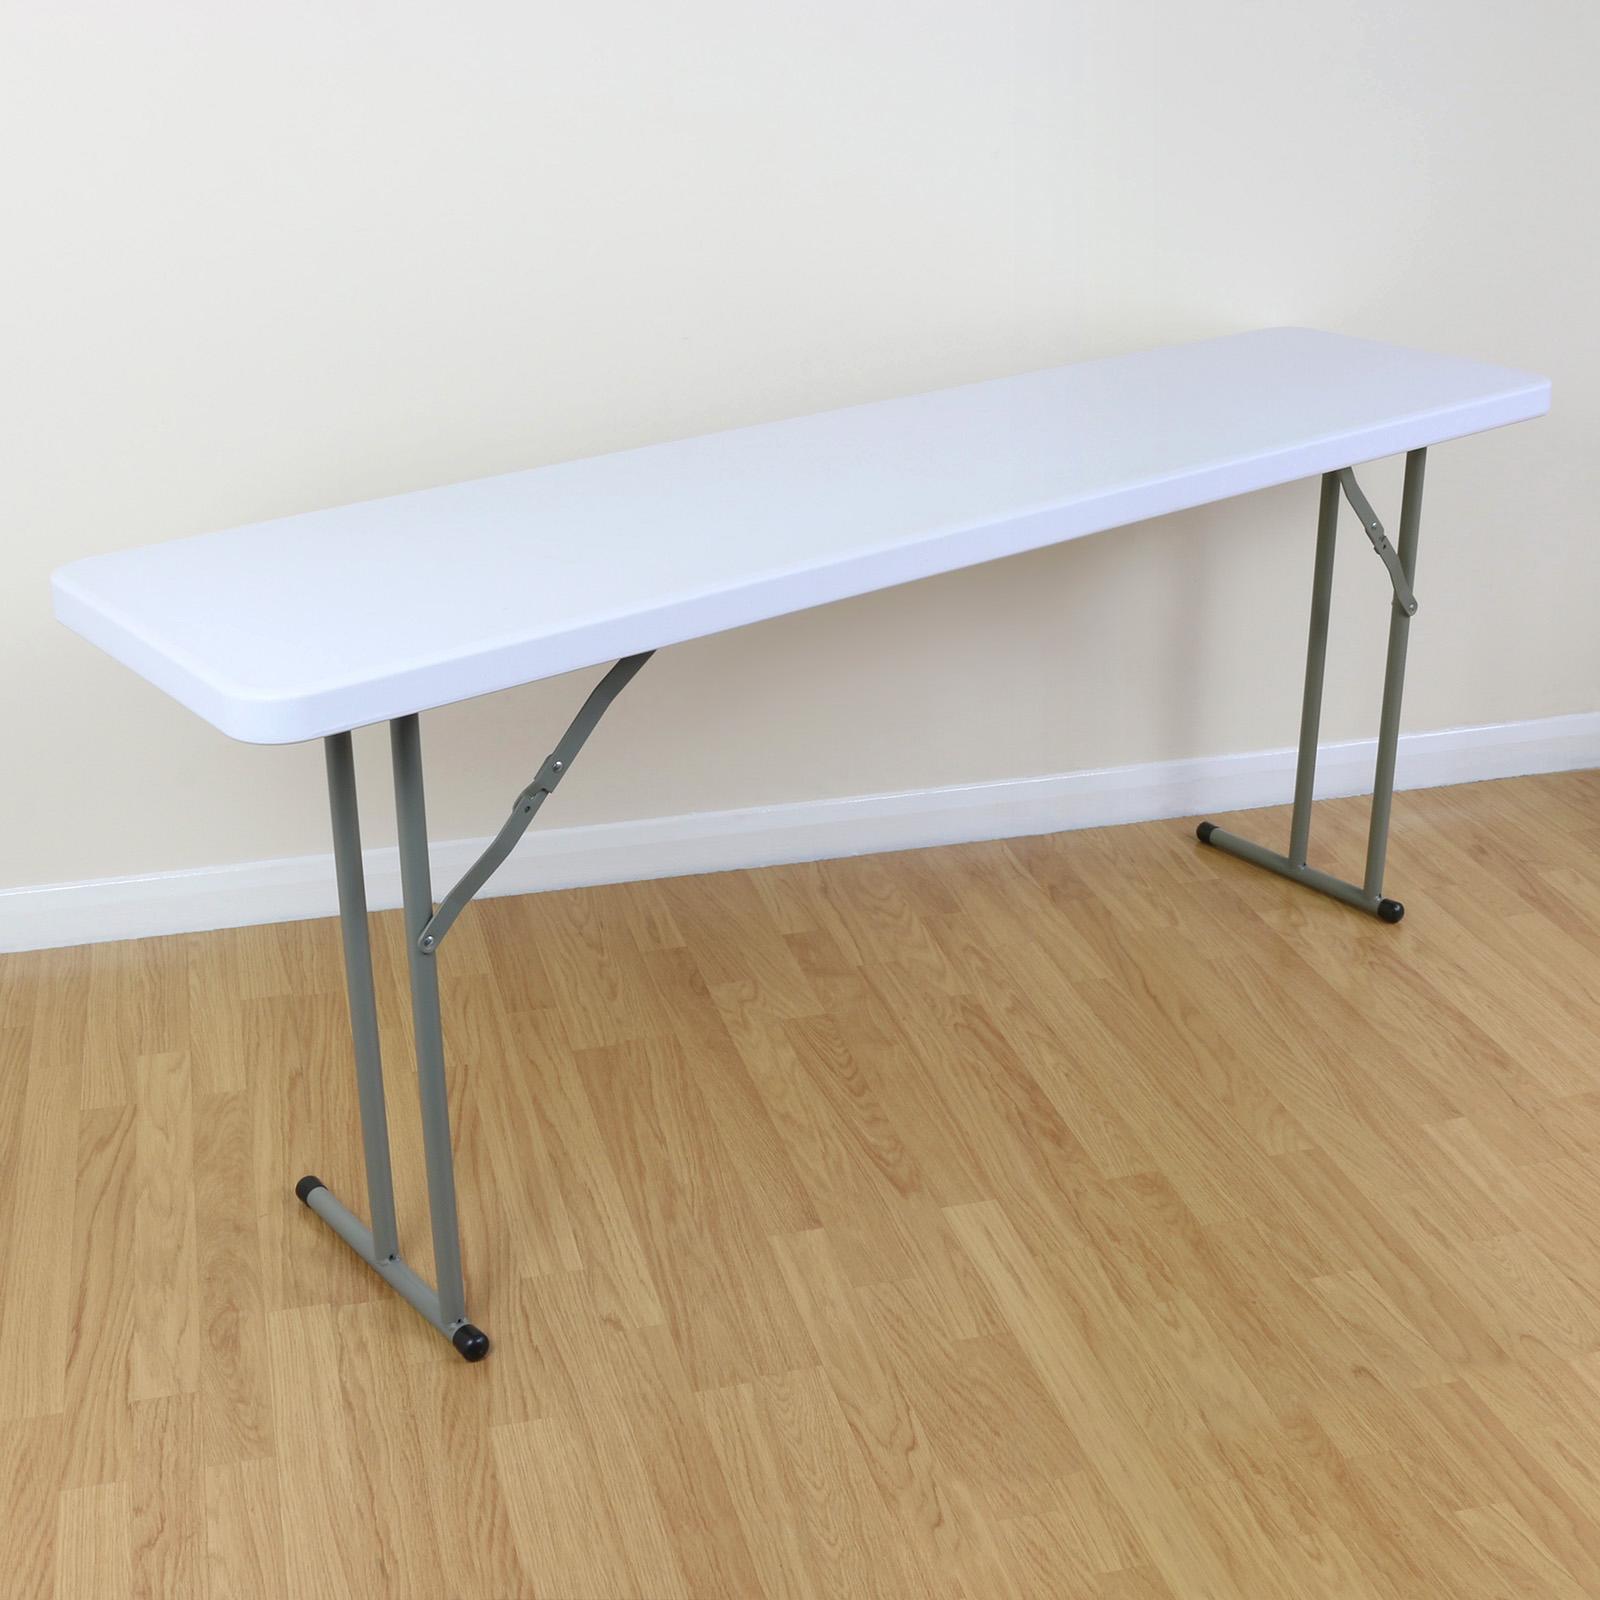 6ft White Narrow Table Folding Legs Outdoor Buffet Garden Party Bbq